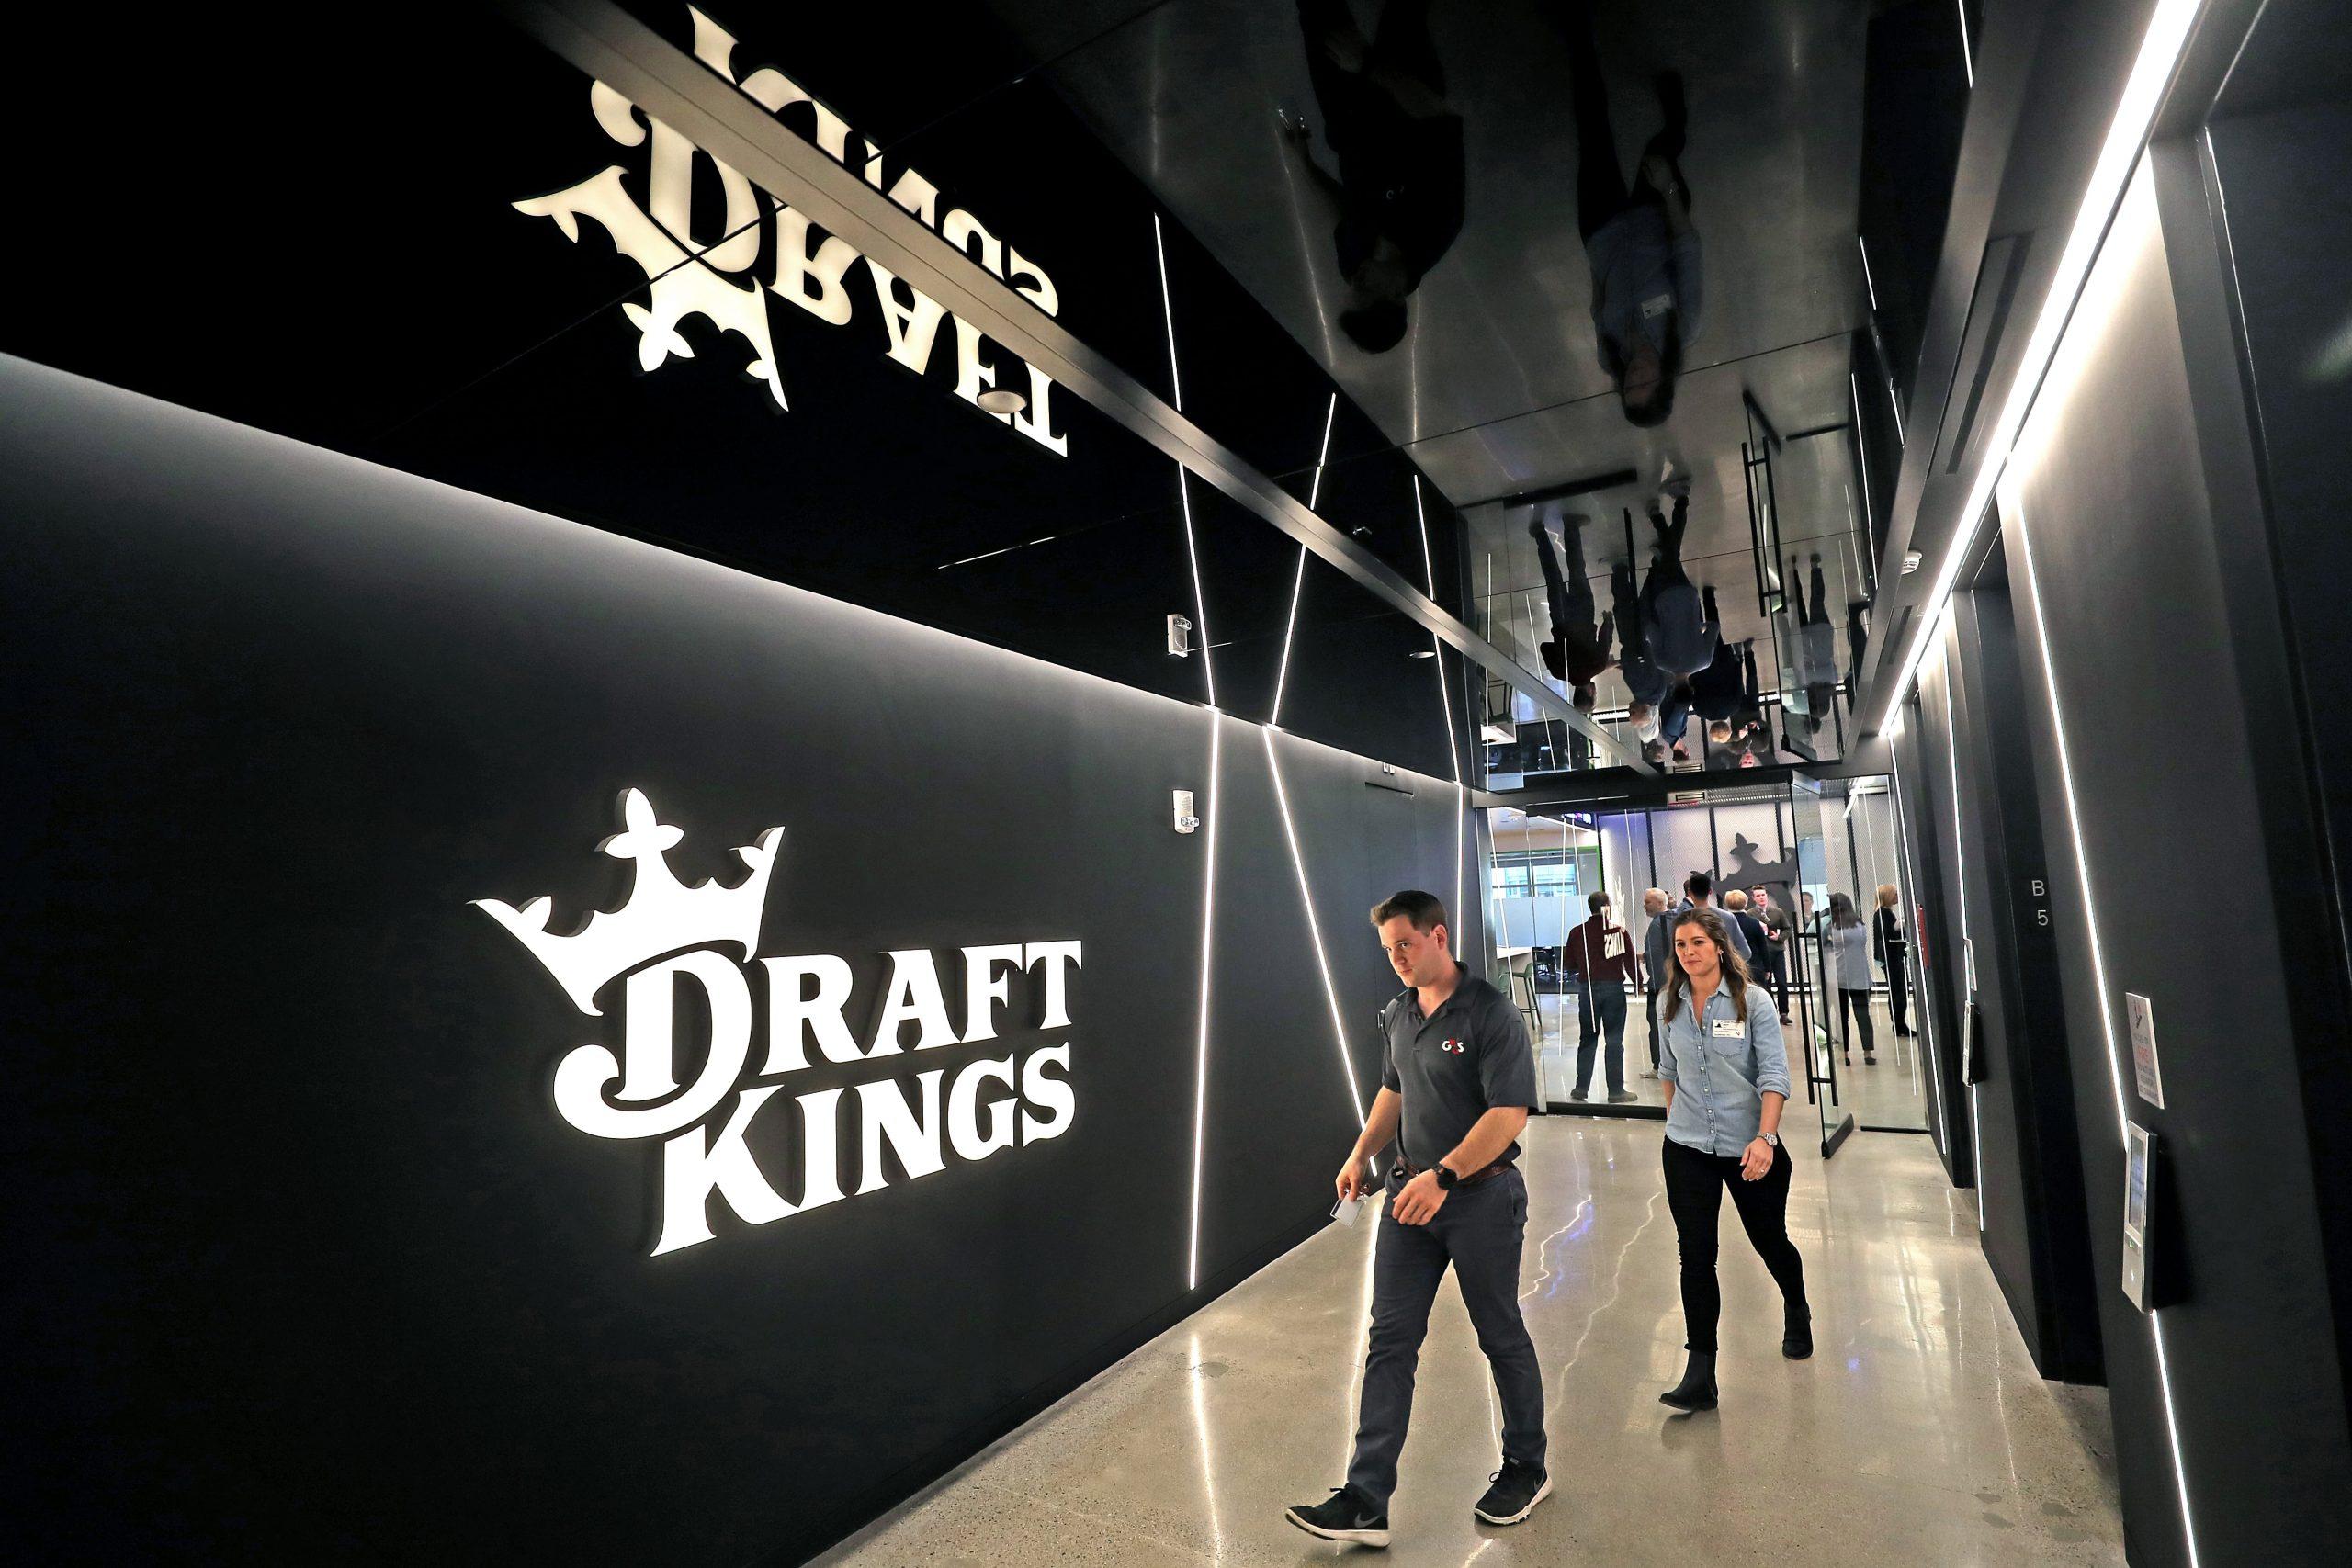 Sportsbook operator DraftKings main office hallway in Boston